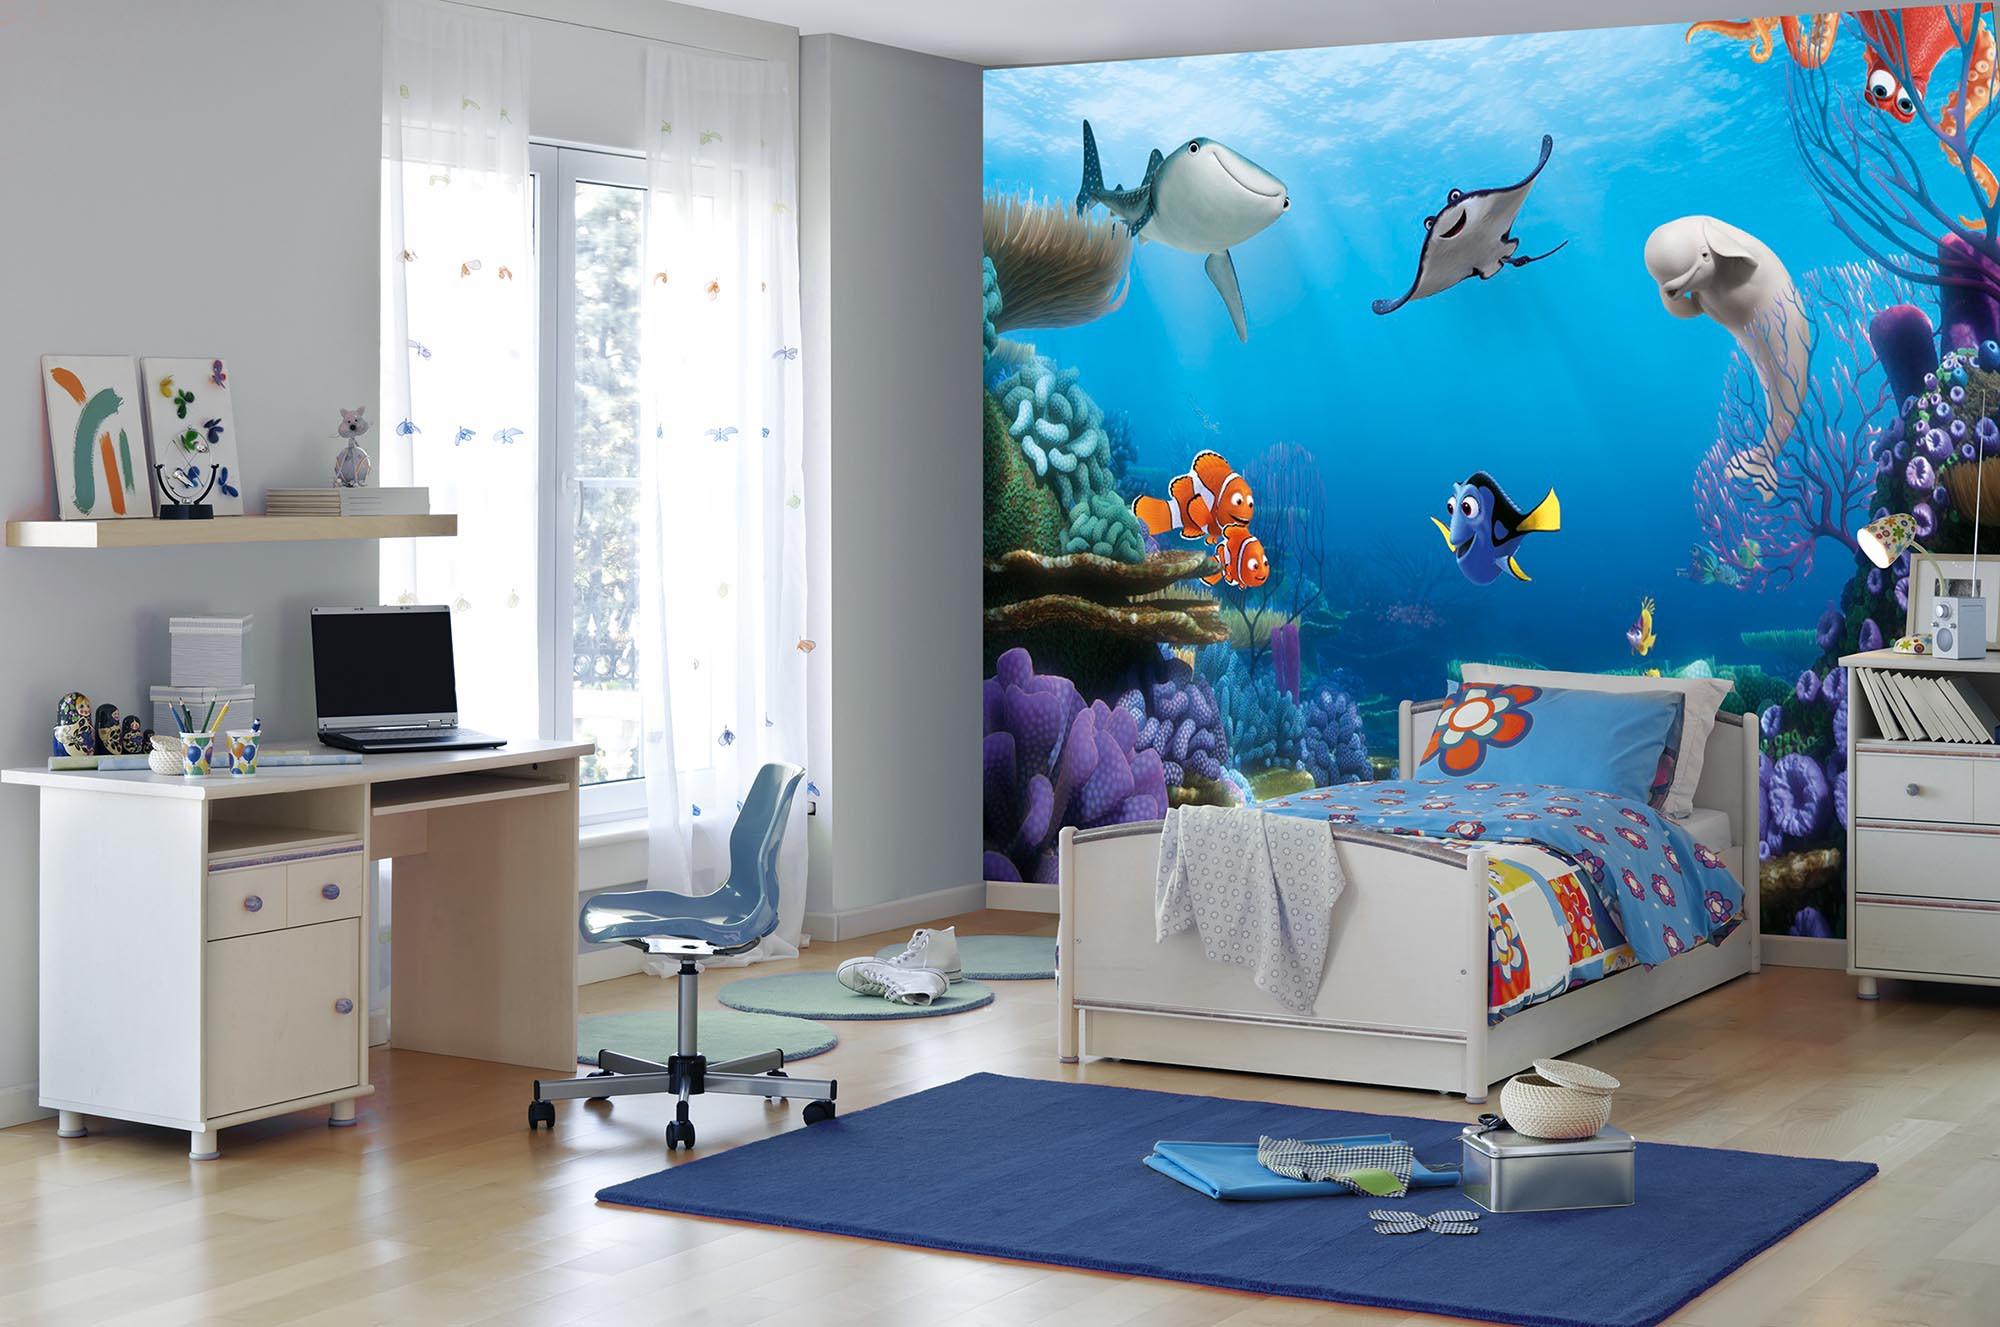 fototapete finding dory von komar disney. Black Bedroom Furniture Sets. Home Design Ideas